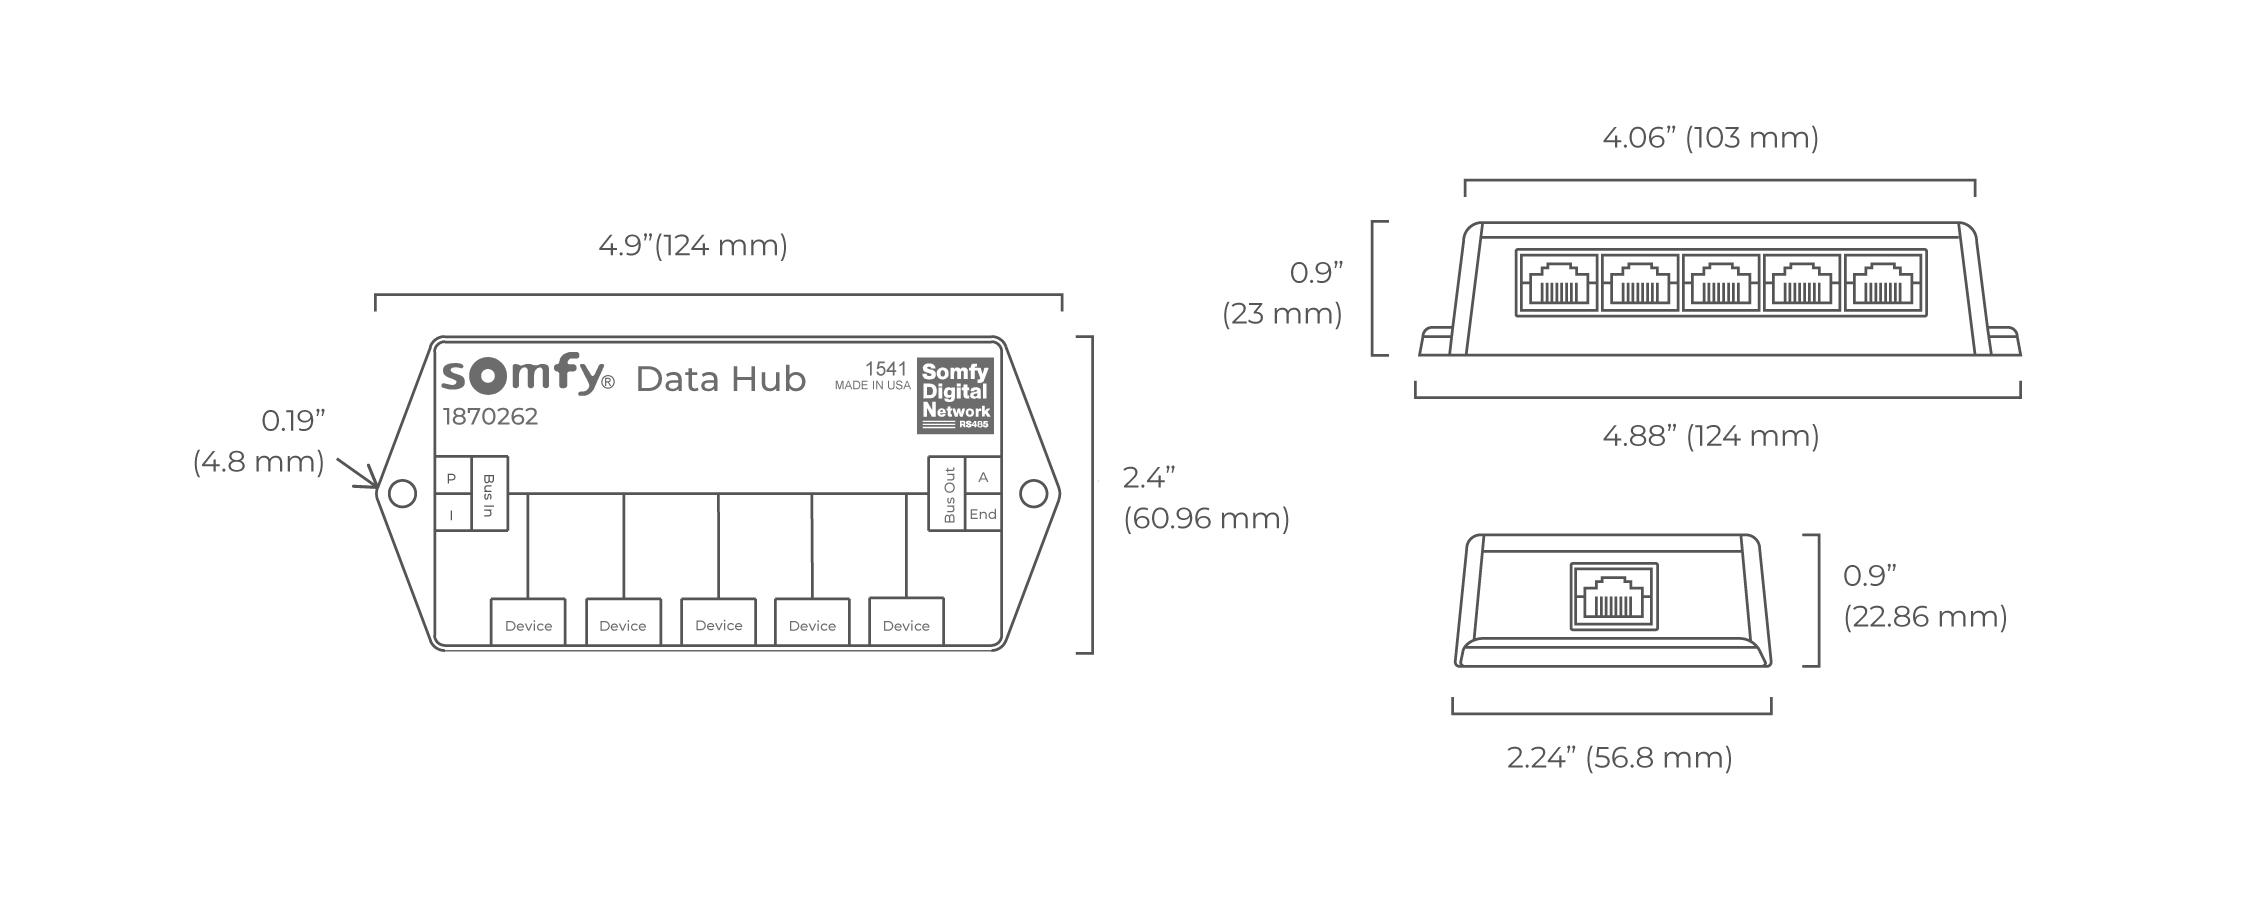 Somfy Data Hub - spec drawing